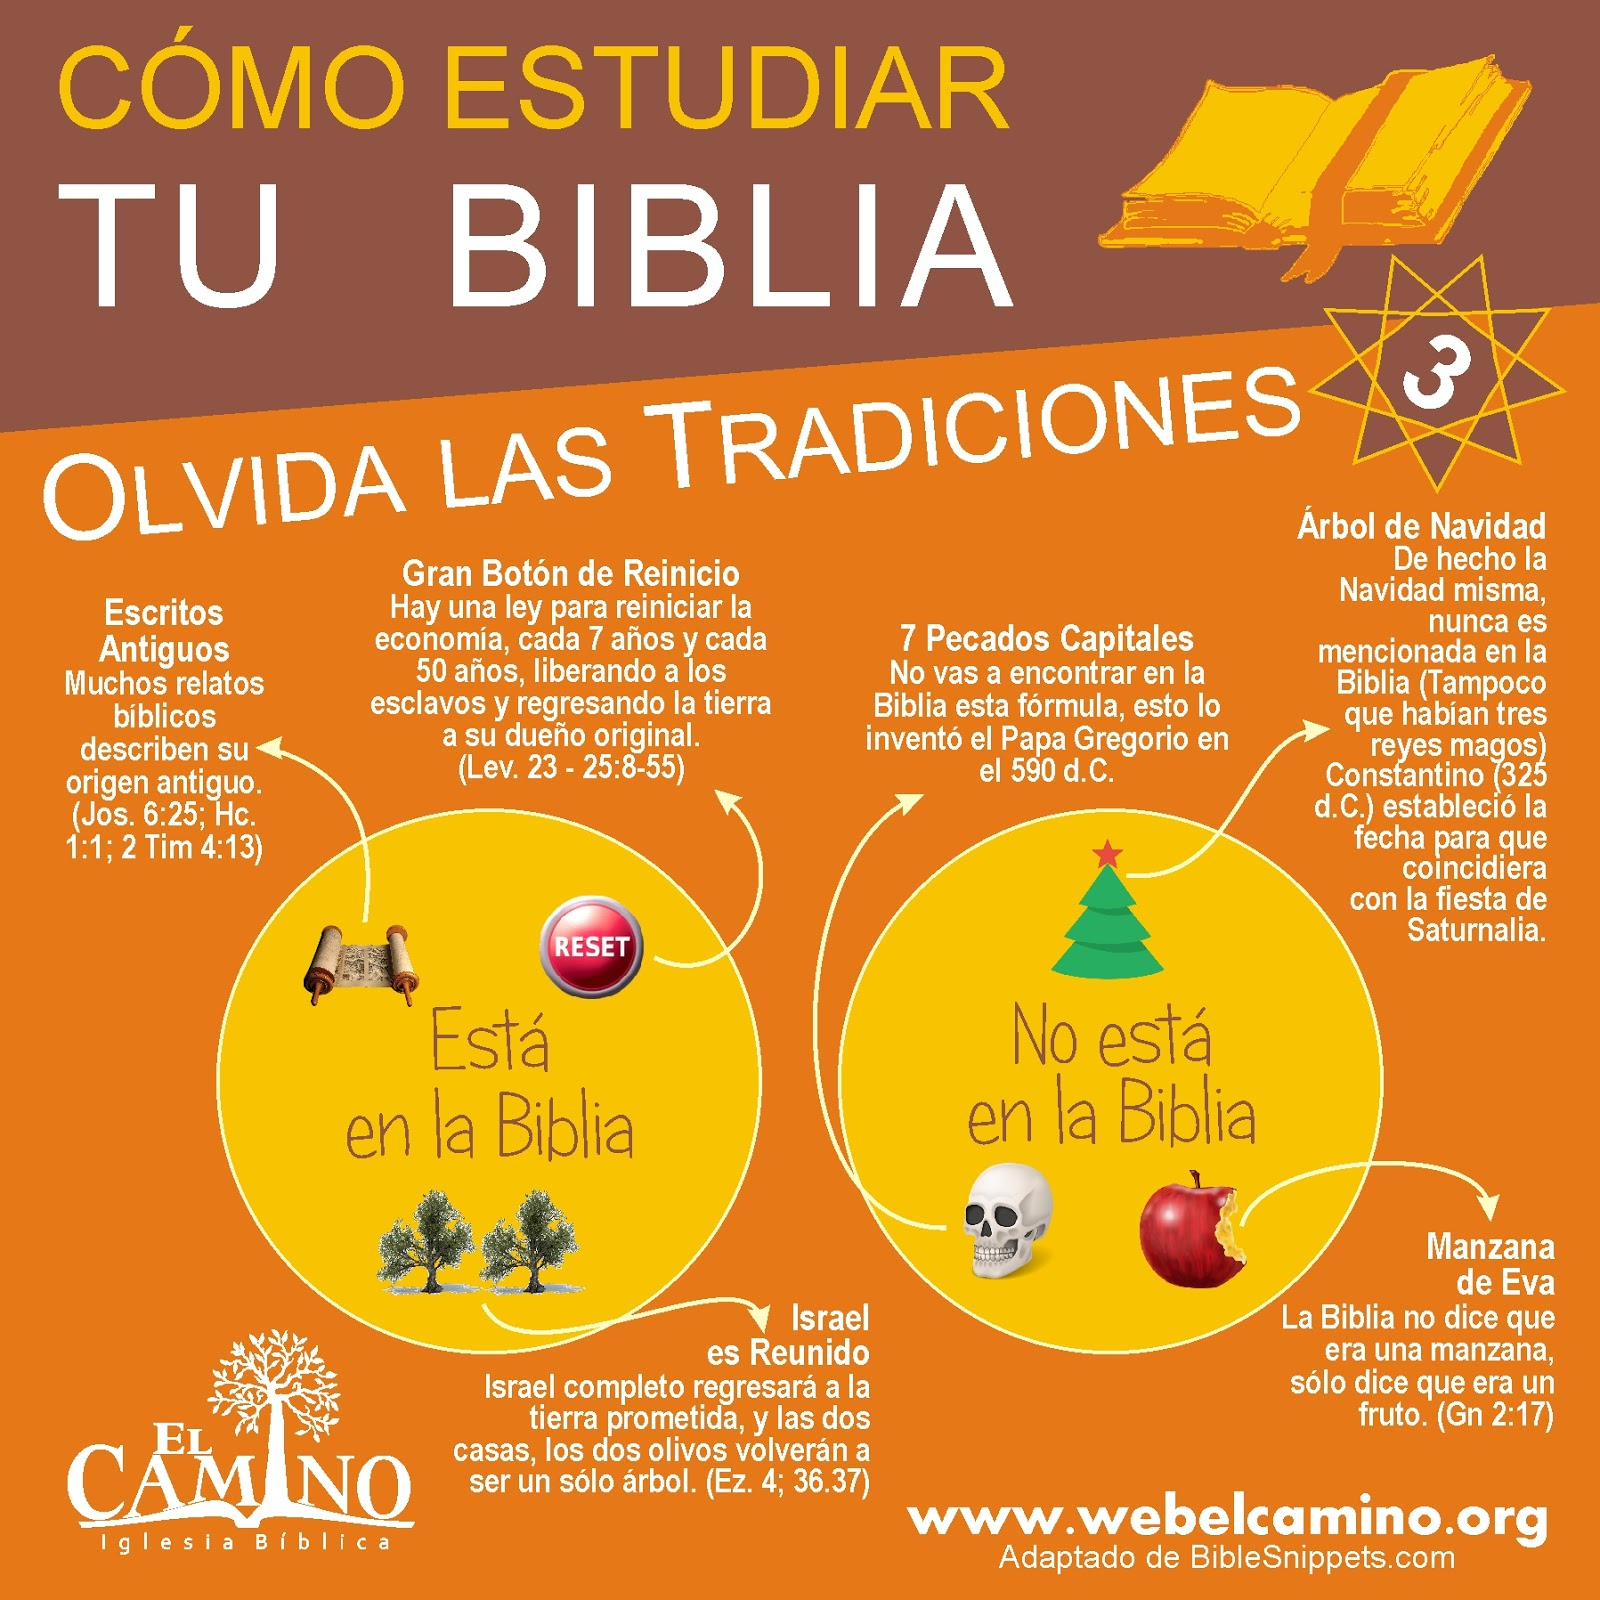 22 Ideas De Biblia Biblia Biblia Cristiana Como Leer La Biblia